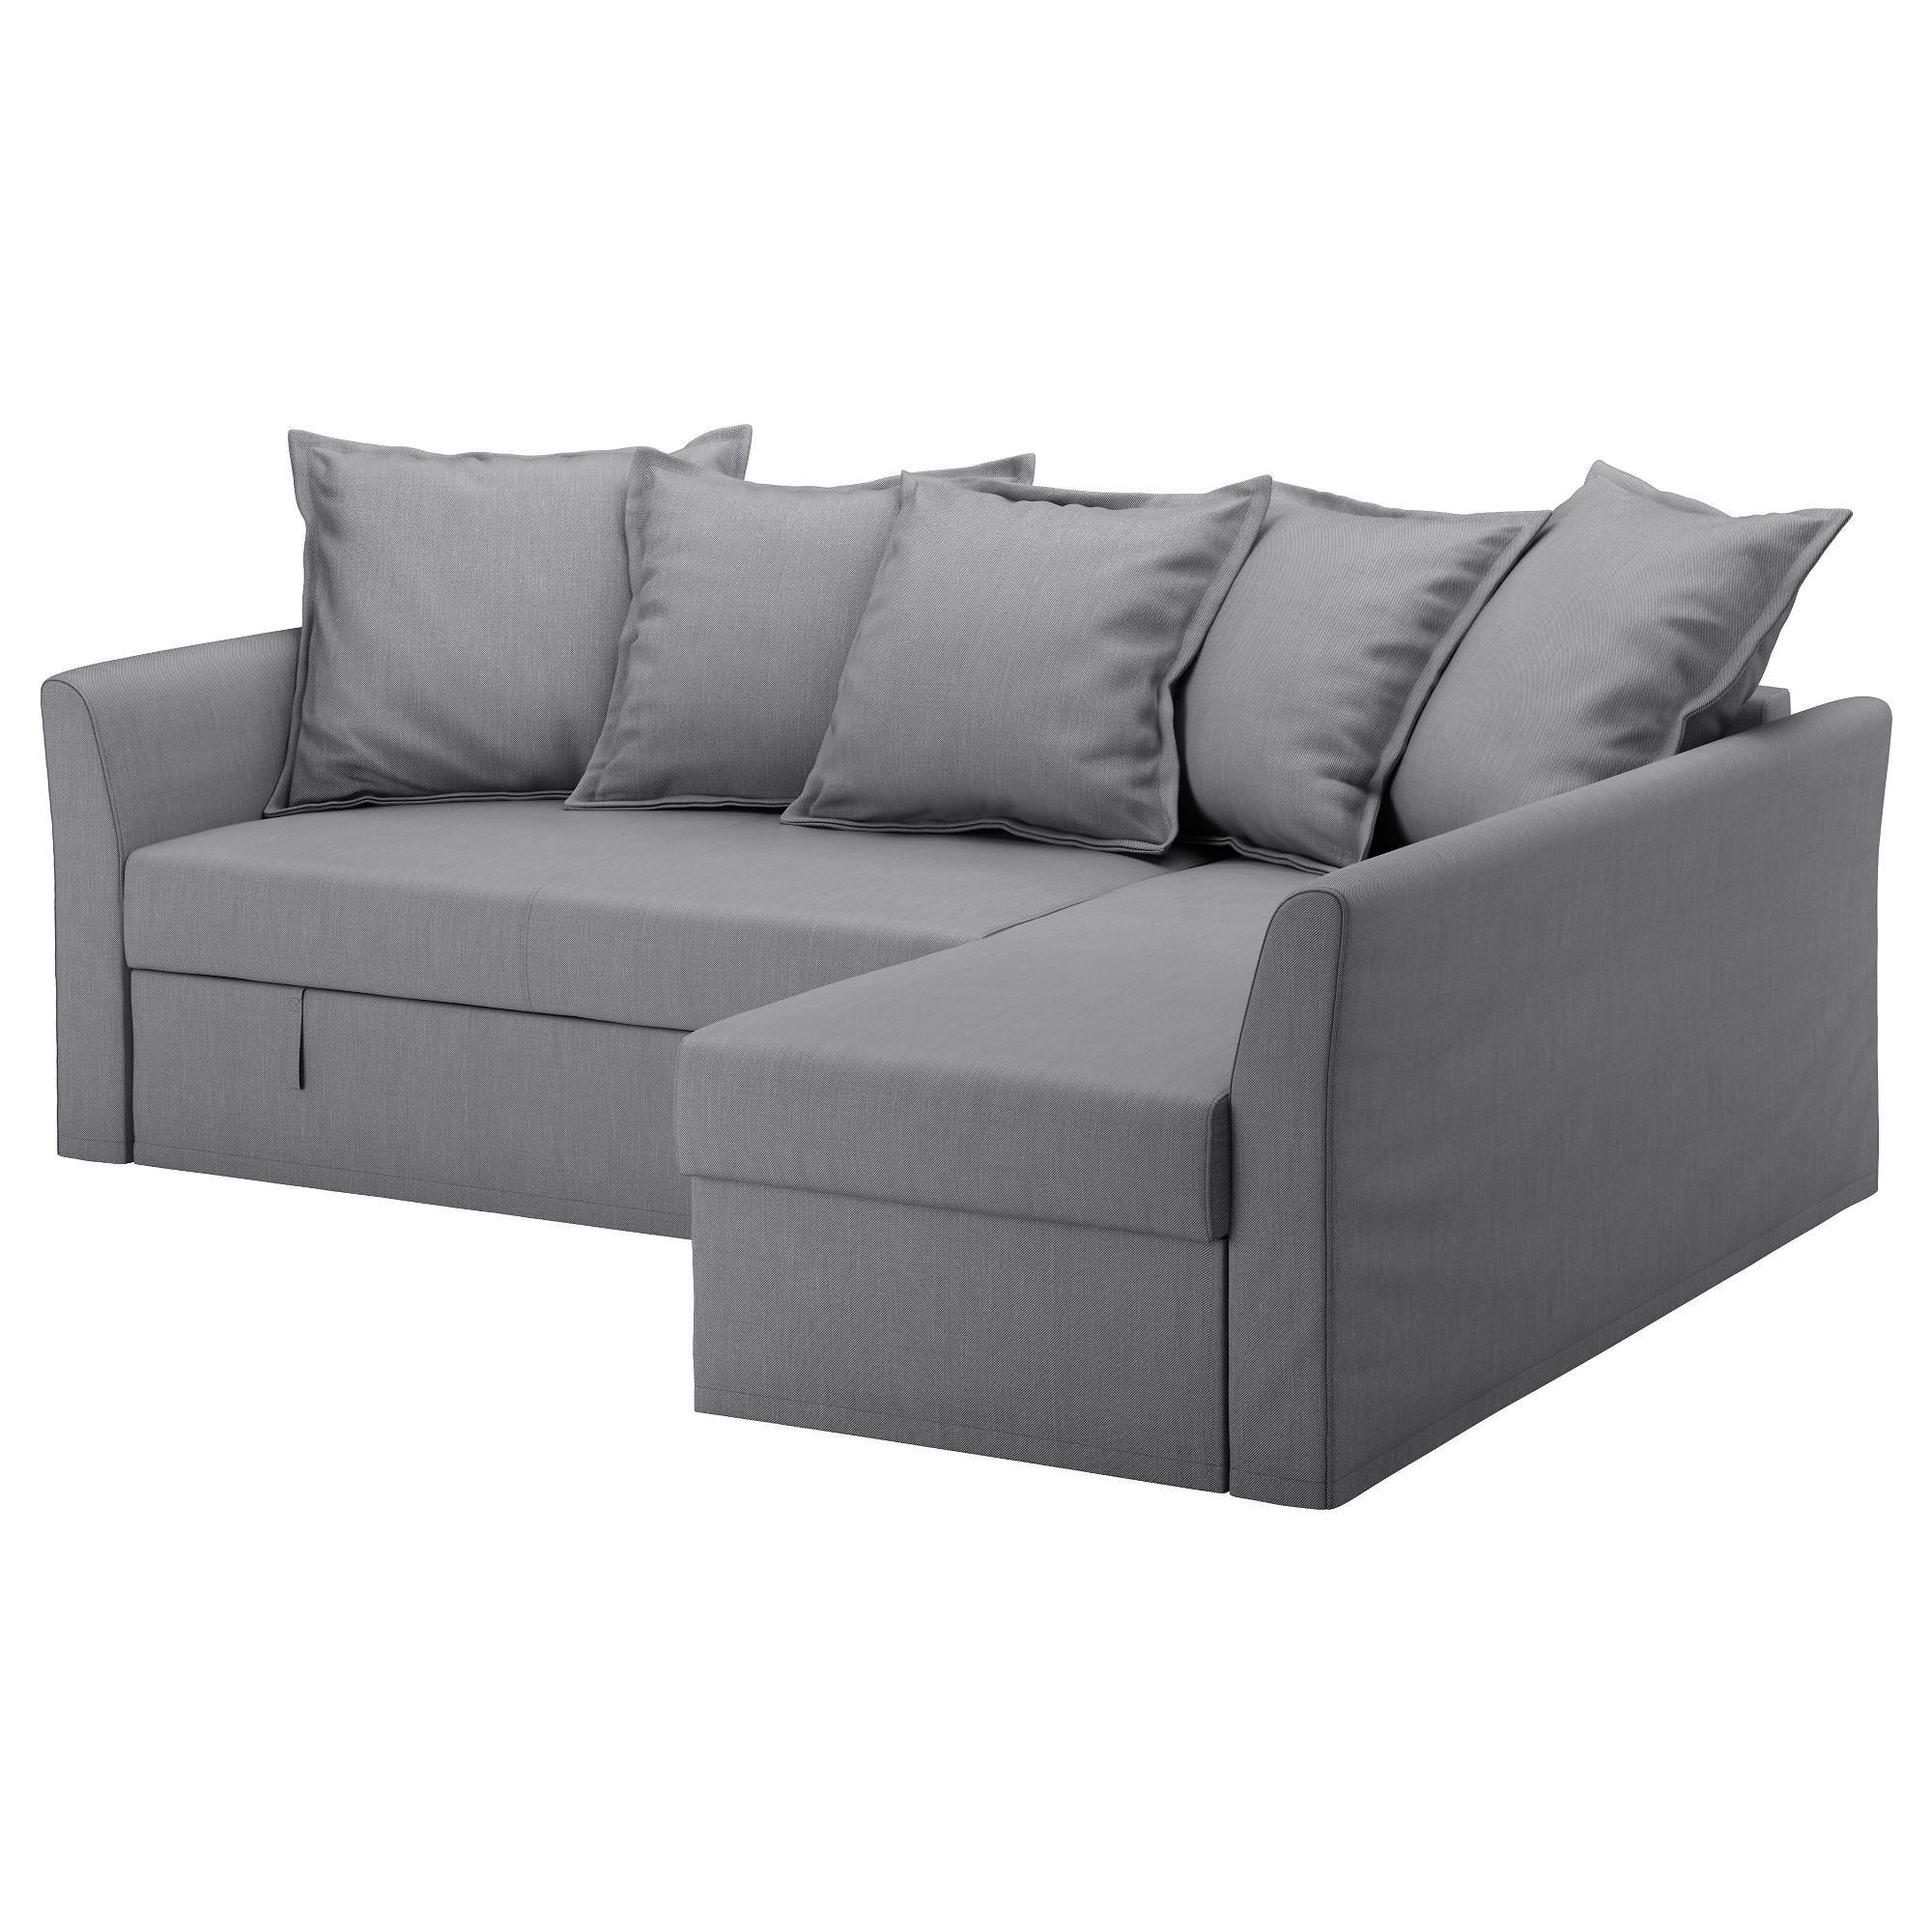 Sammlung von Ikea Sectional Schlafsofa - Mobelde.com ...